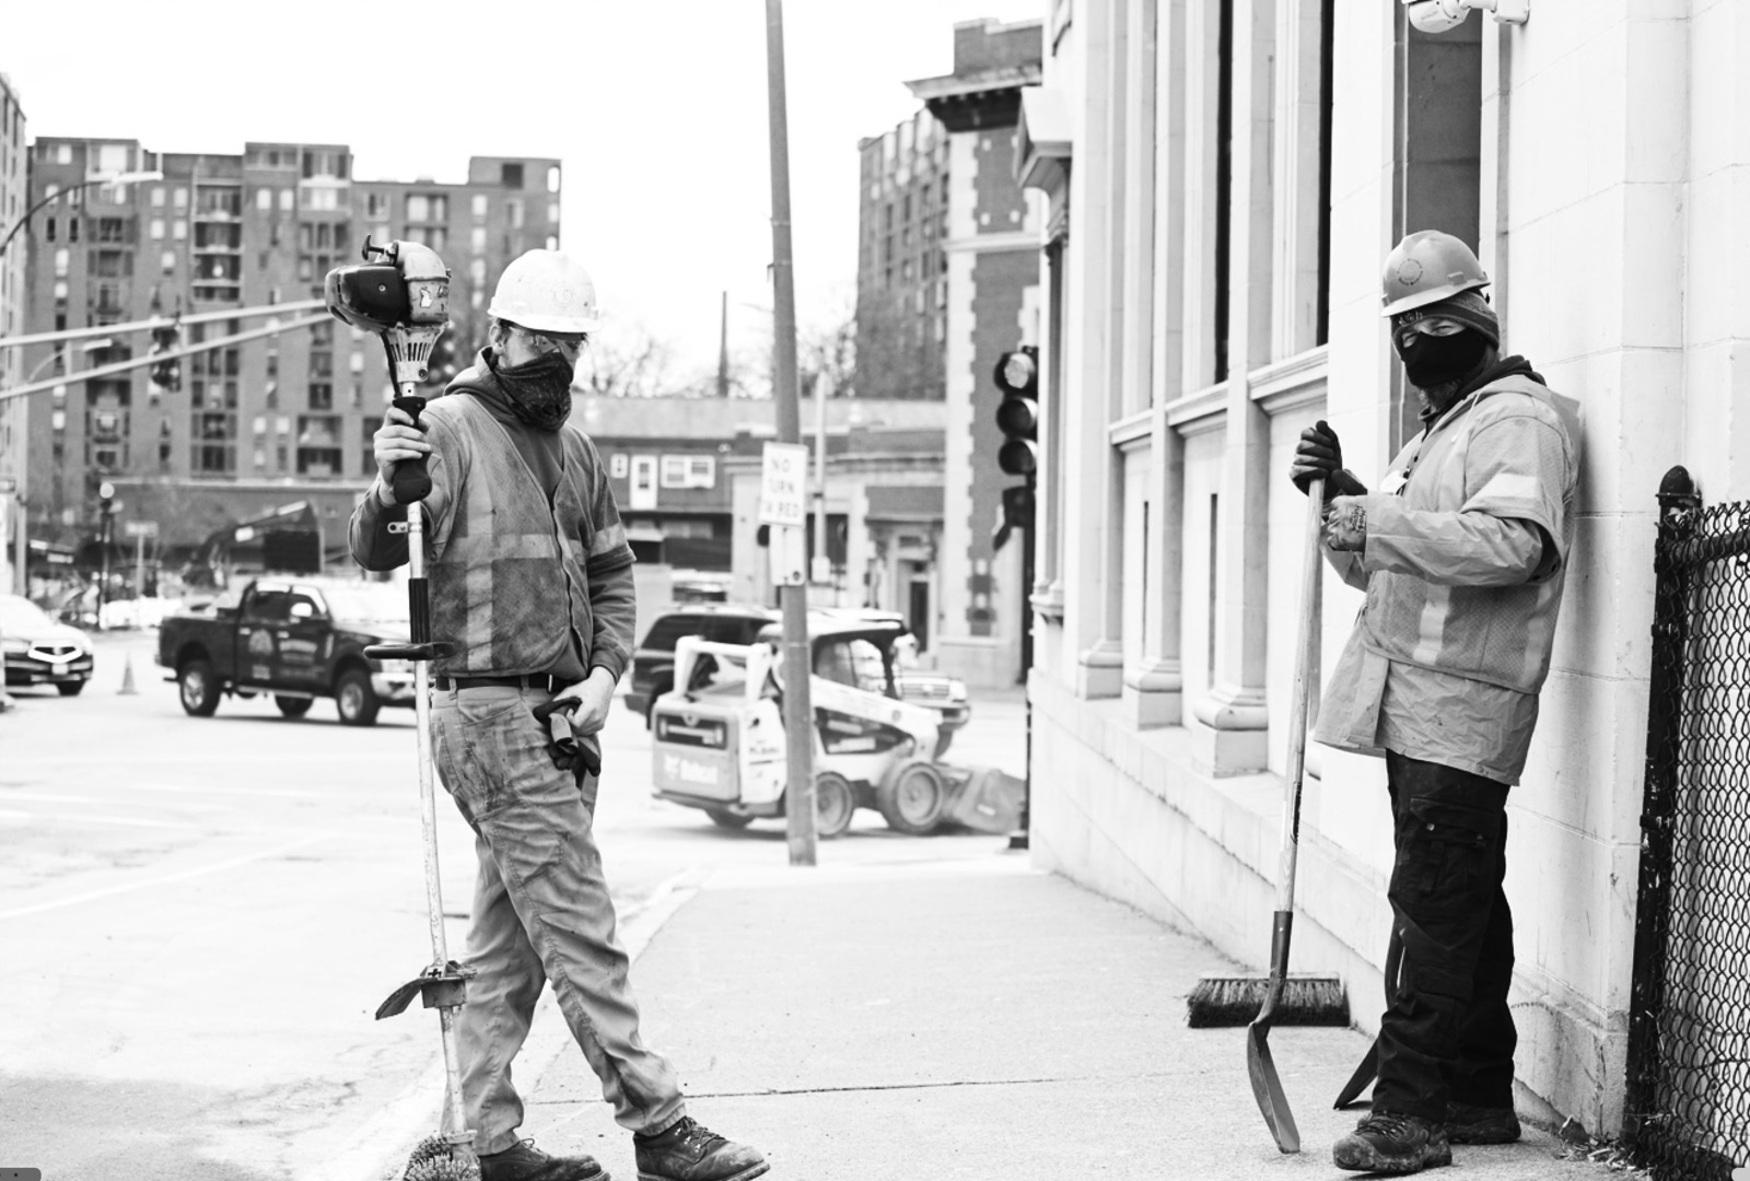 utility workers on sidewalk